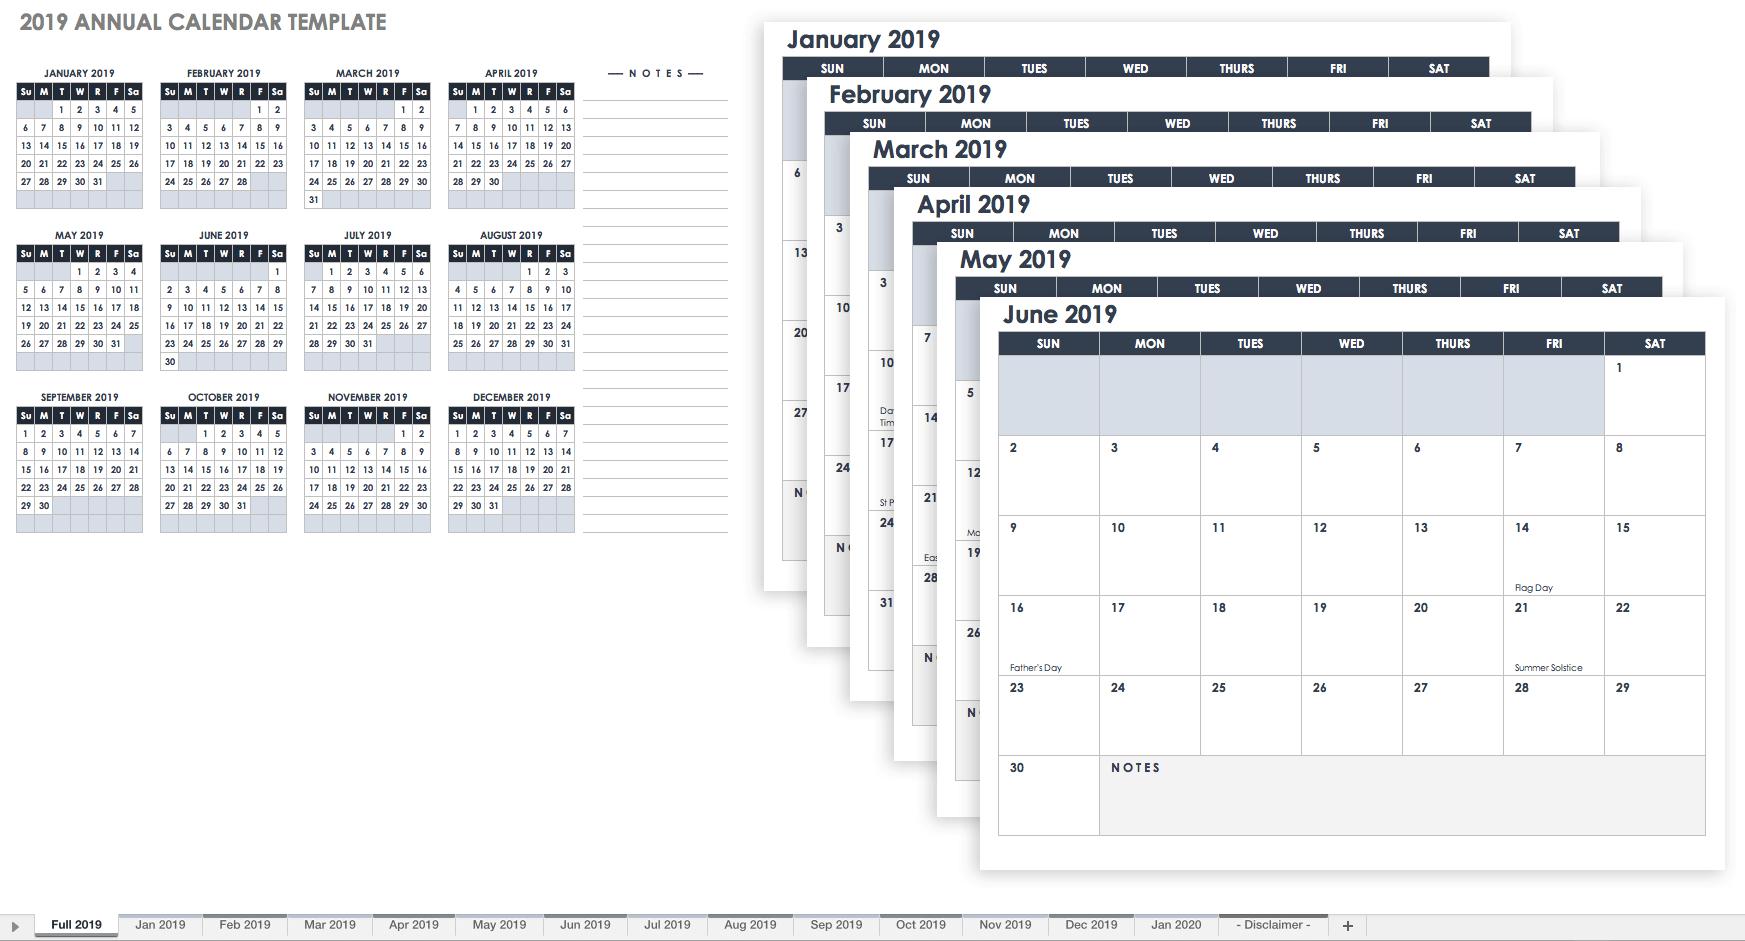 15 Free Monthly Calendar Templates | Smartsheet regarding Calendar Blank Planner Months 18 School Year